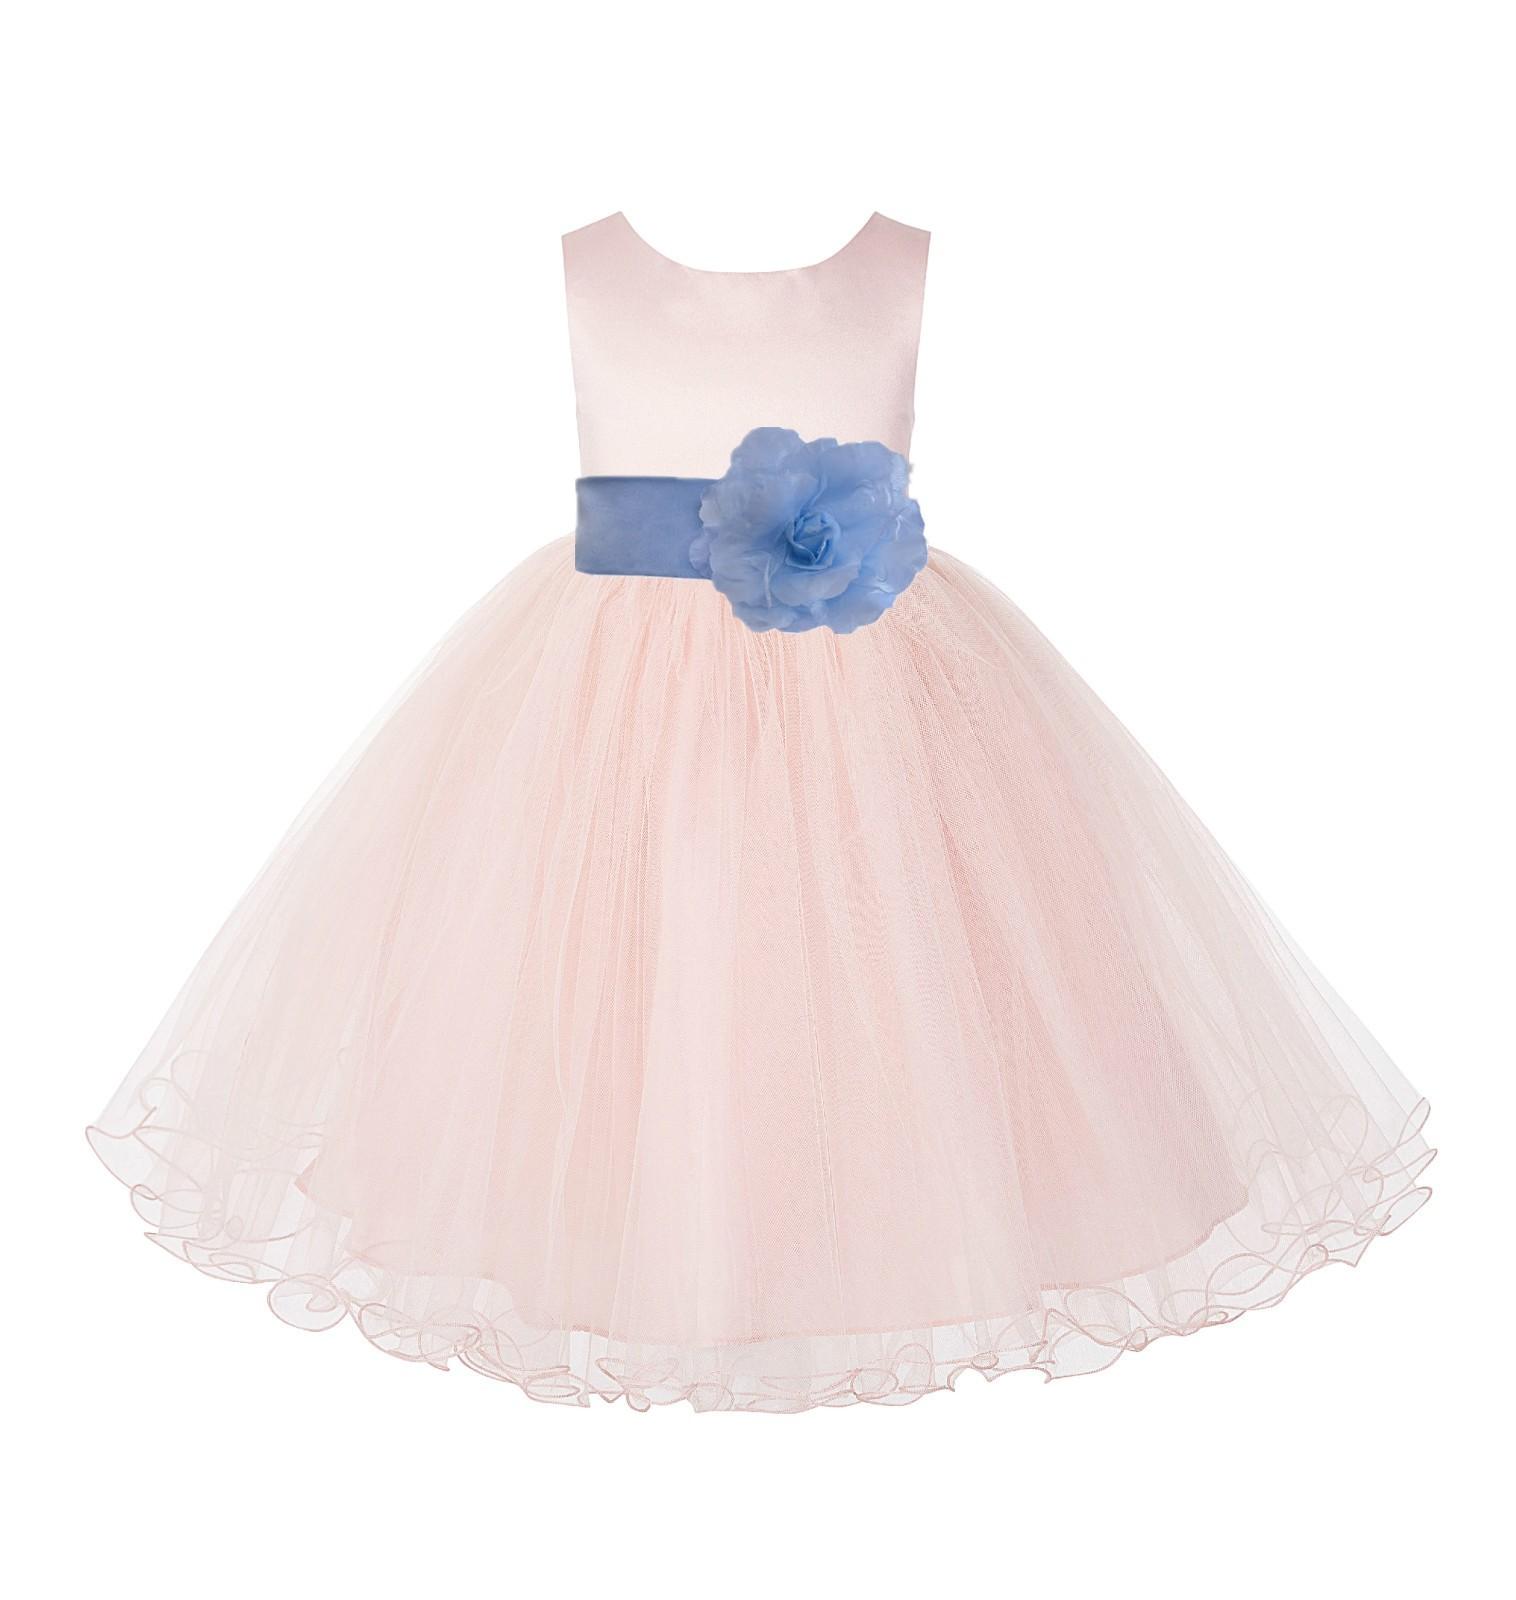 Blush PInk / Sky Tulle Rattail Edge Flower Girl Dress Wedding Bridesmaid 829T